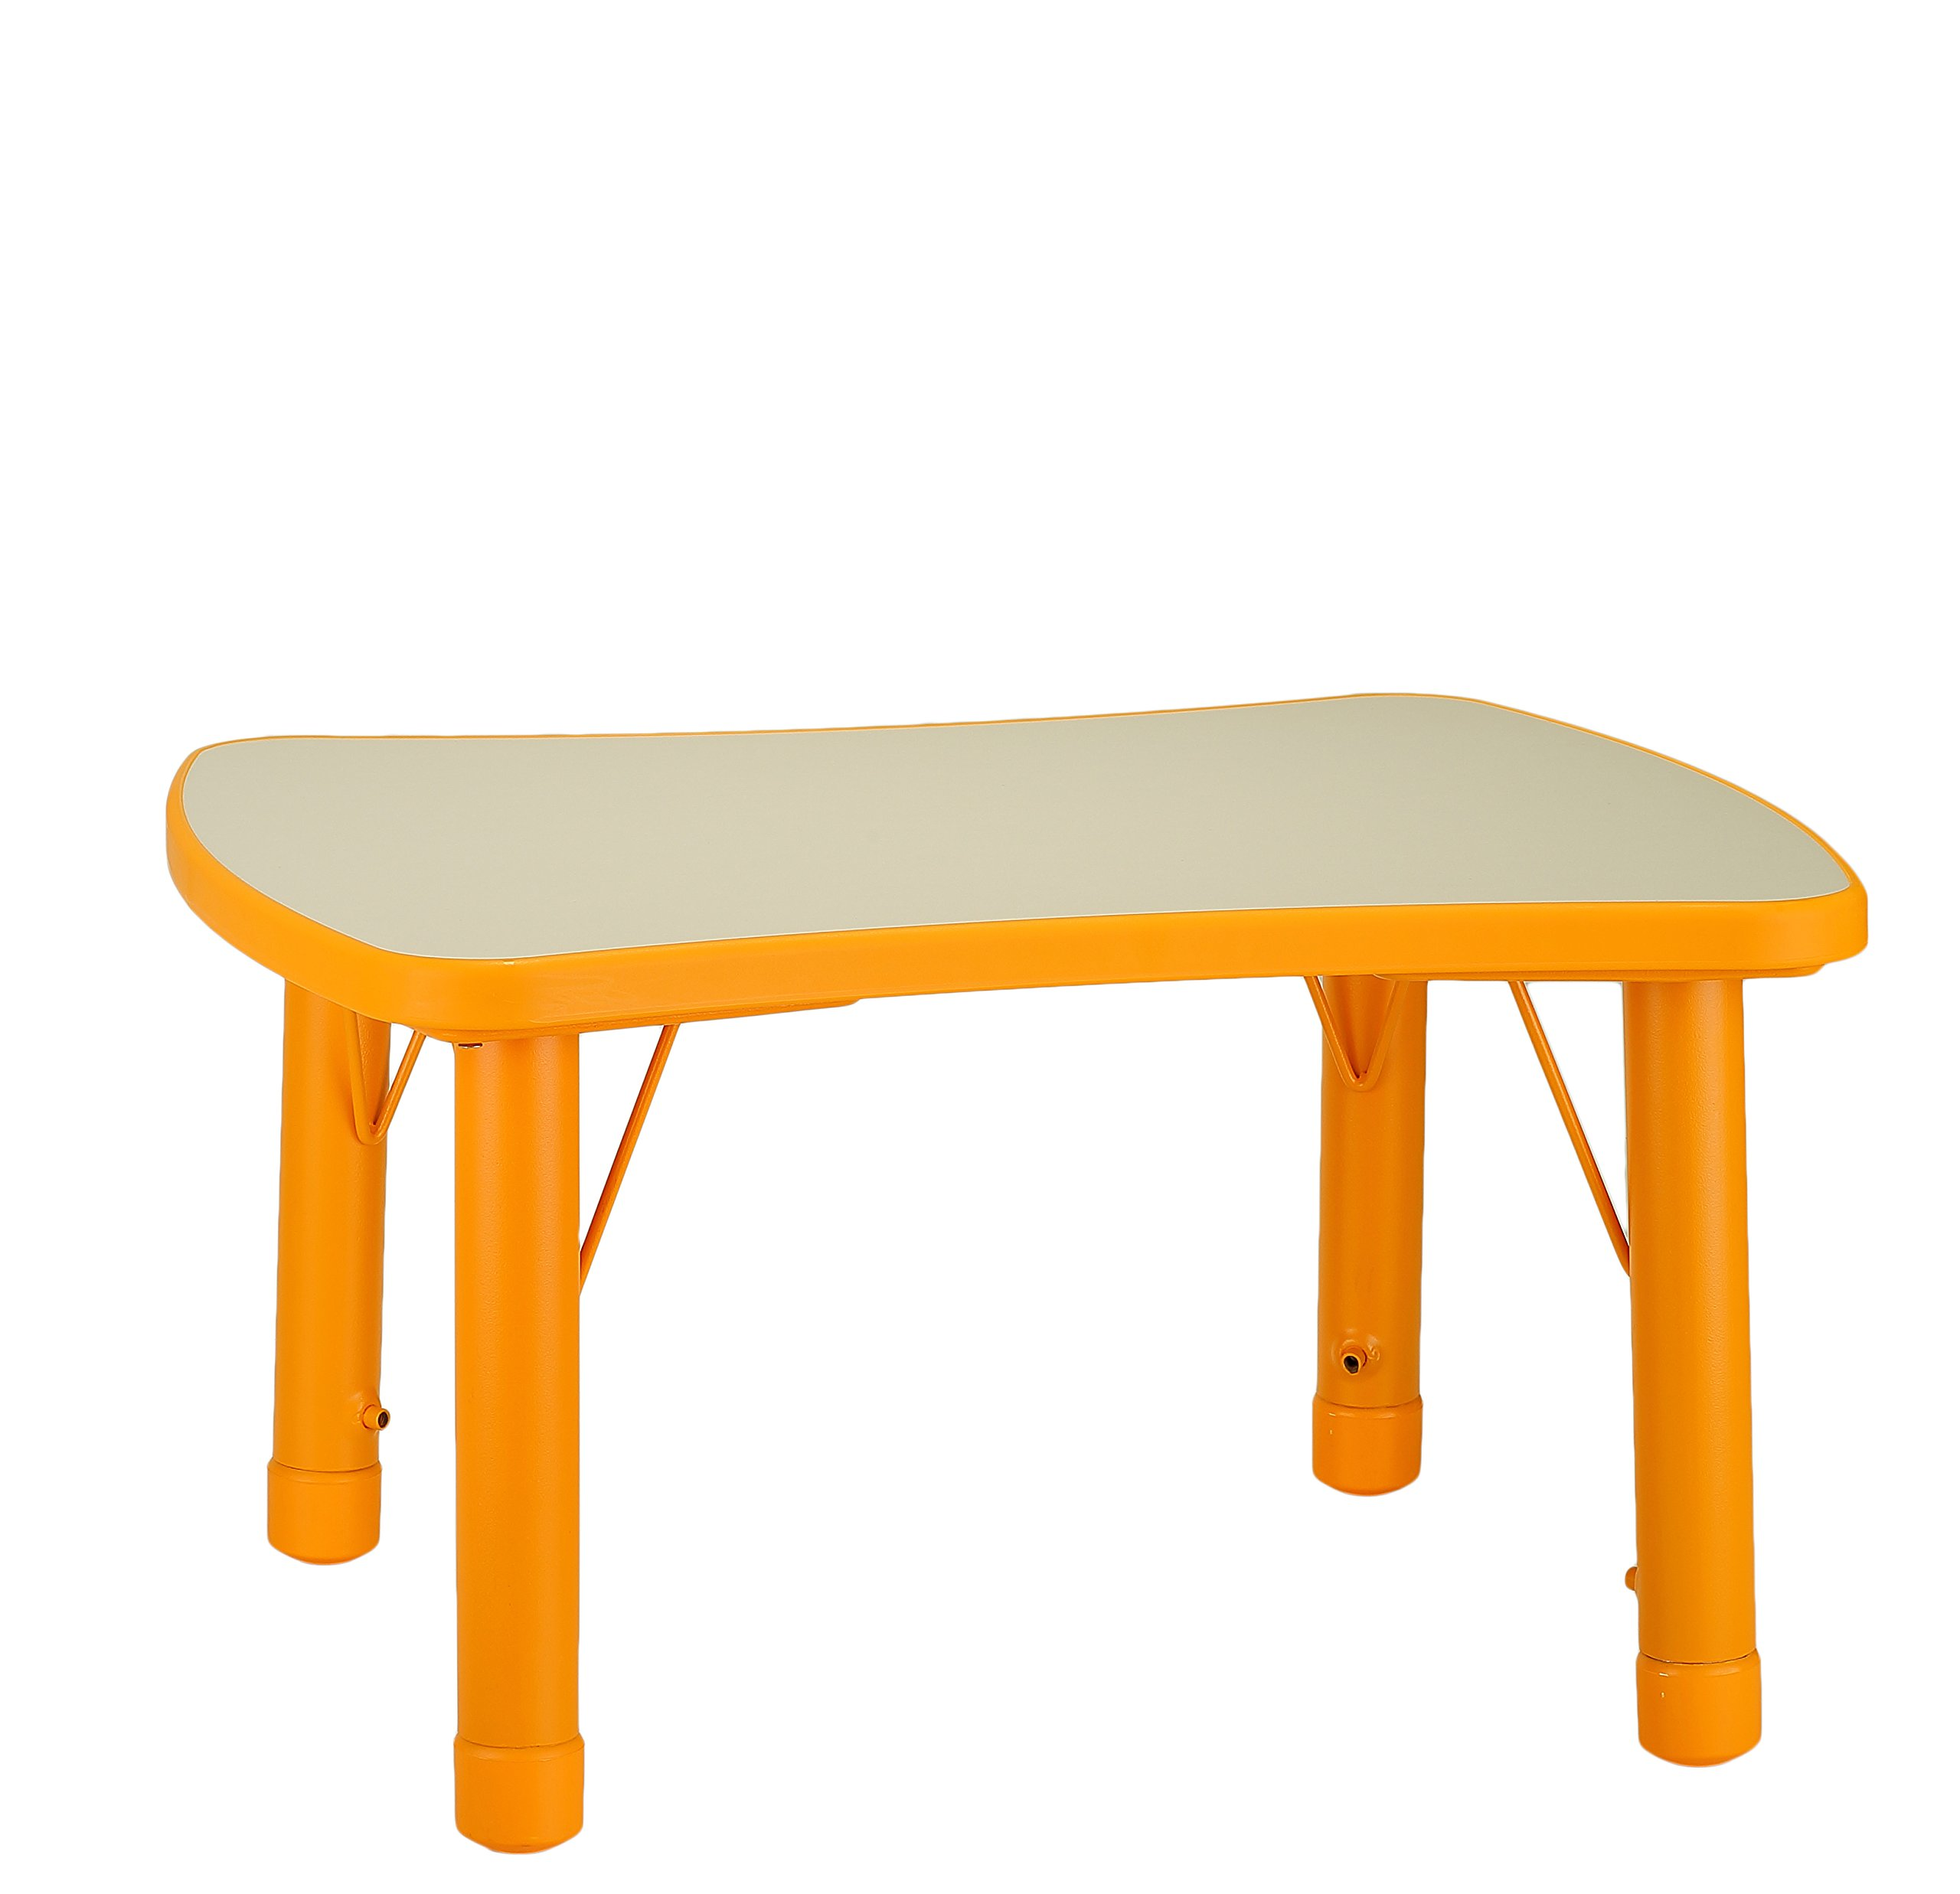 Cozy4Kids Adjustable Soap Shaped Plastic Activity Table, Atomic Orange by Cozy4Kids (Image #1)